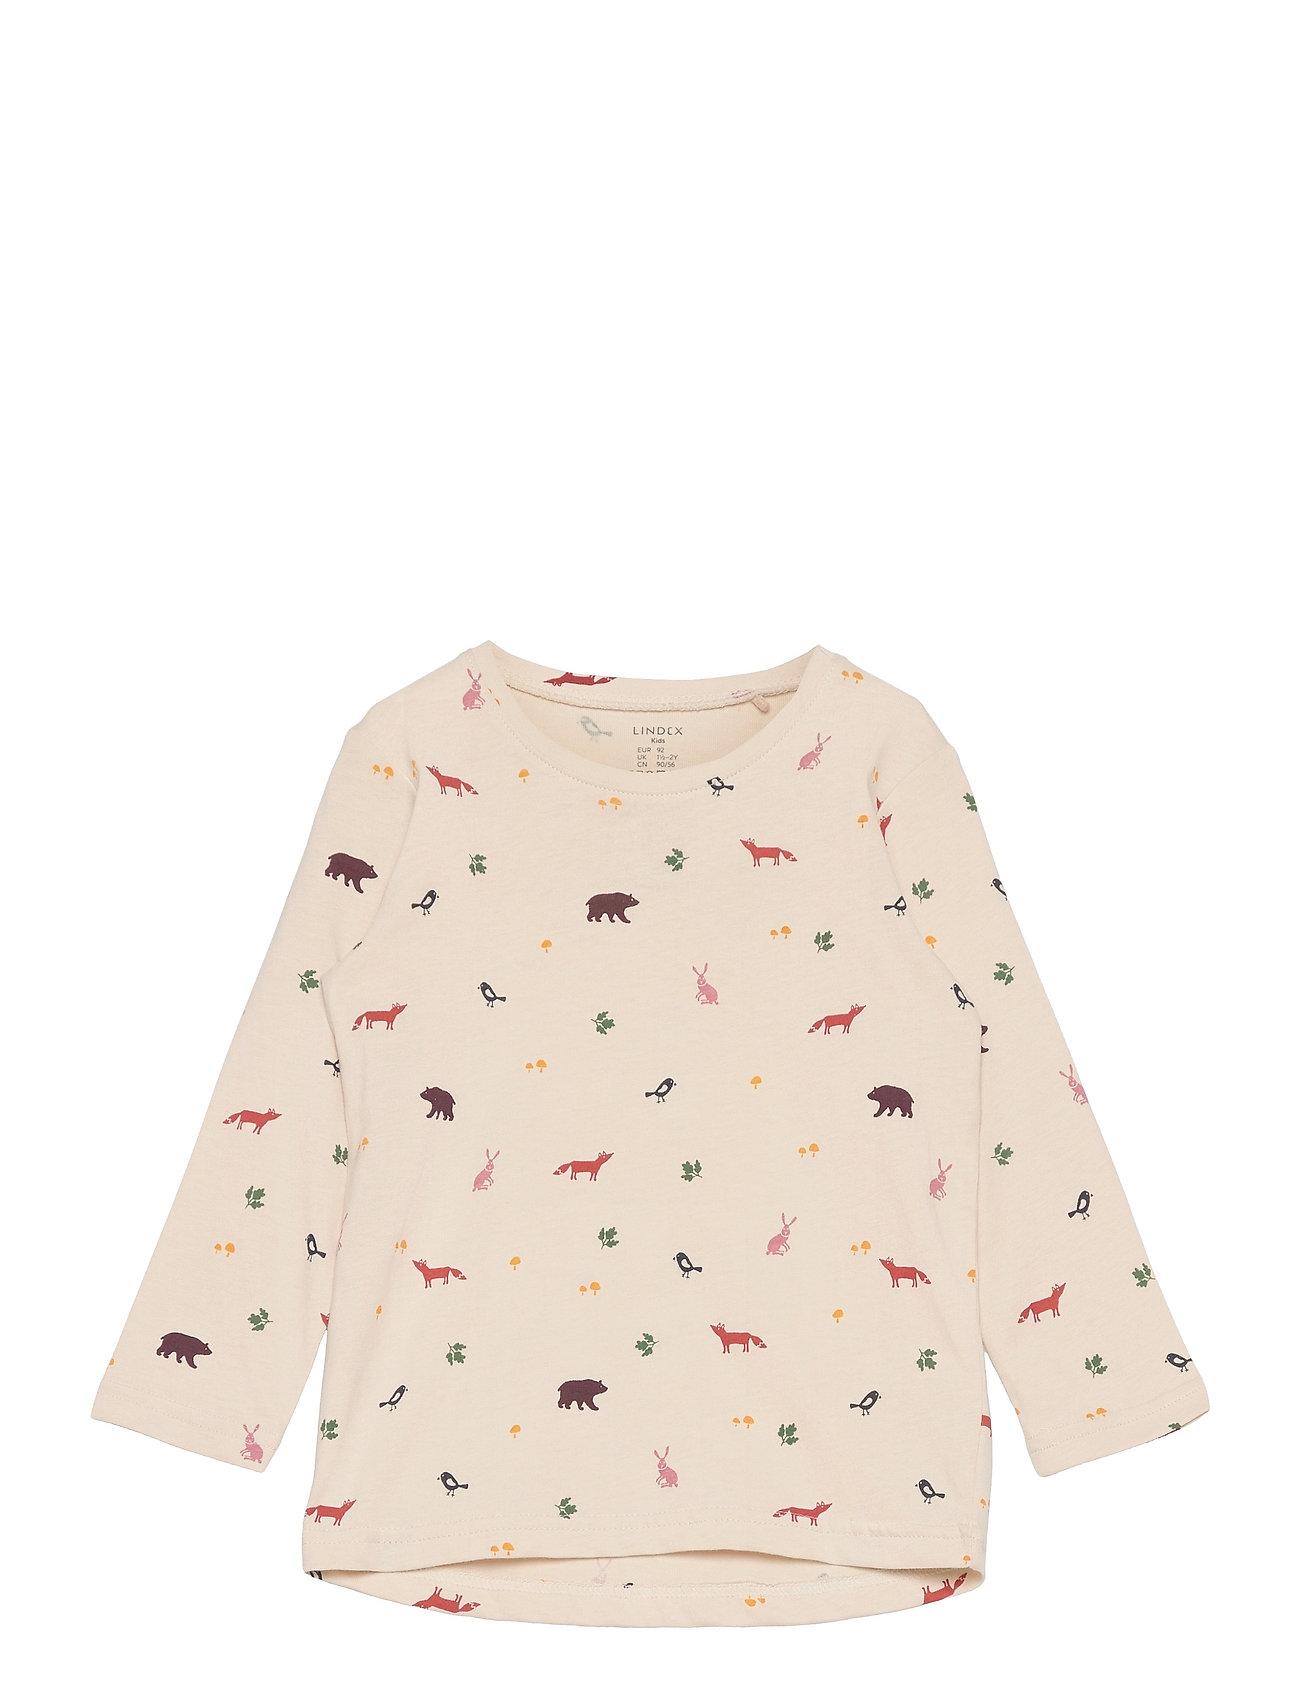 Top L S Basic Ao Print Langærmet T-shirt Beige Lindex